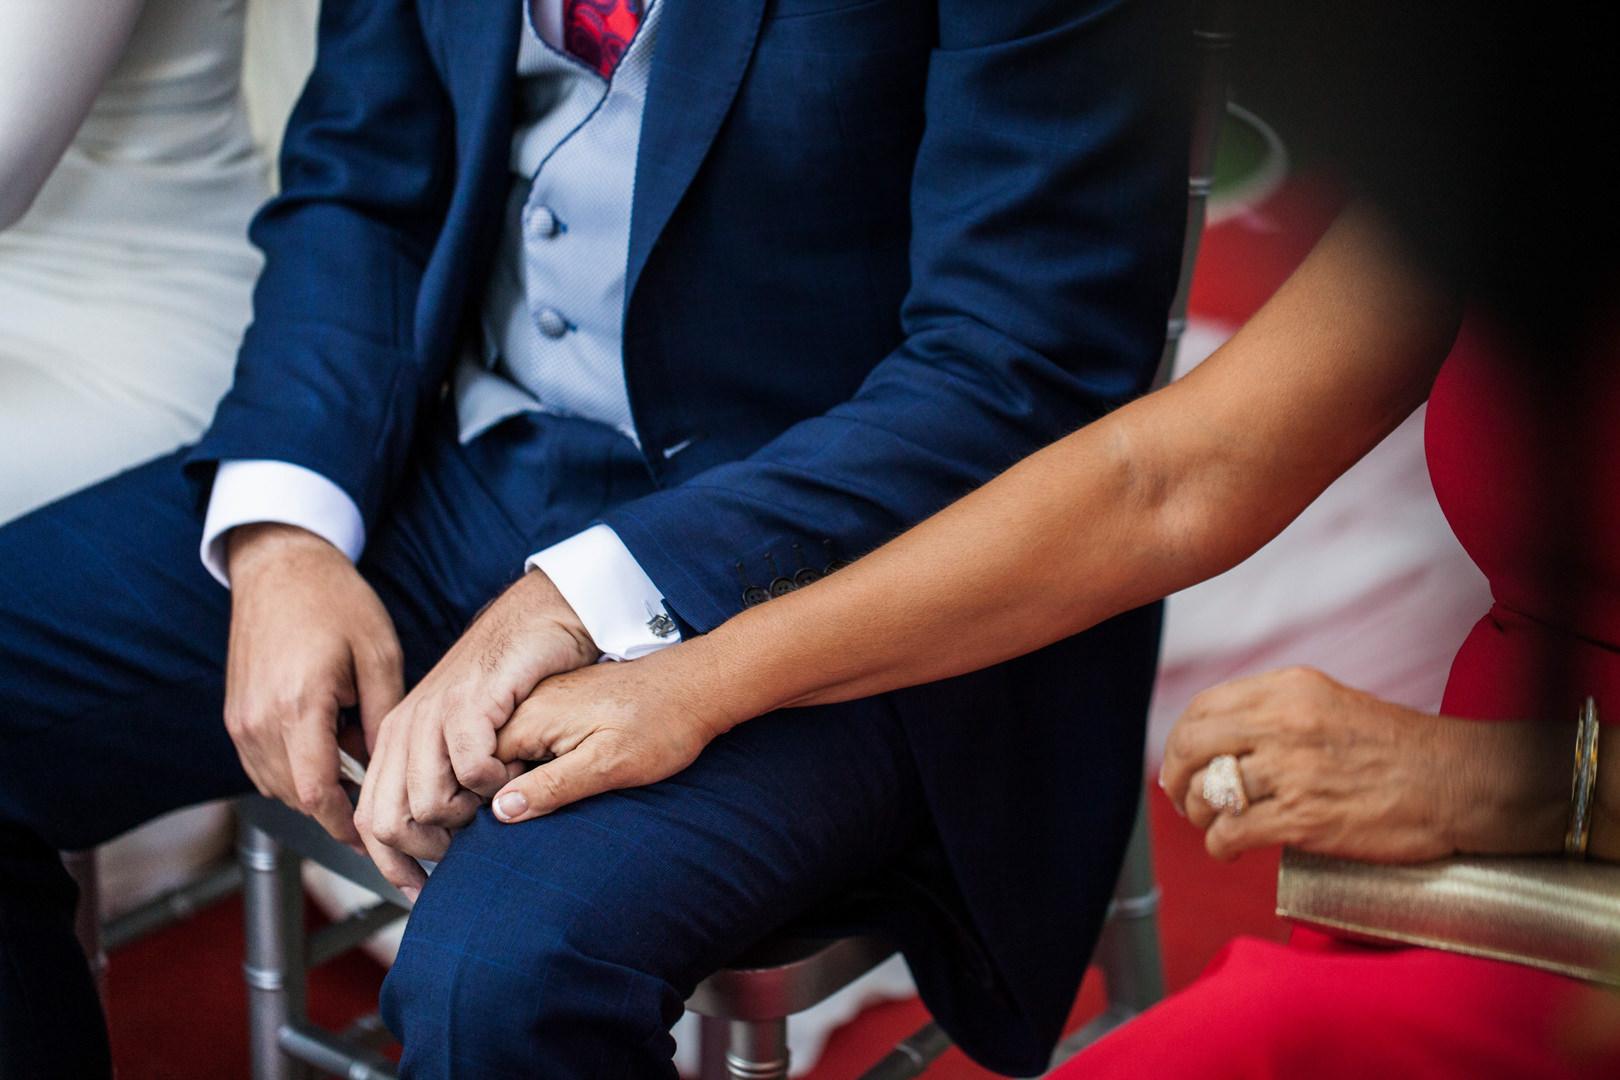 Boda-Irene-Marcos-Dos-Hermanas-Finca-Clotidle-engagement-Rafael-Torres-fotografo-bodas-sevilla-madrid-barcelona-wedding-photographer--24.jpg